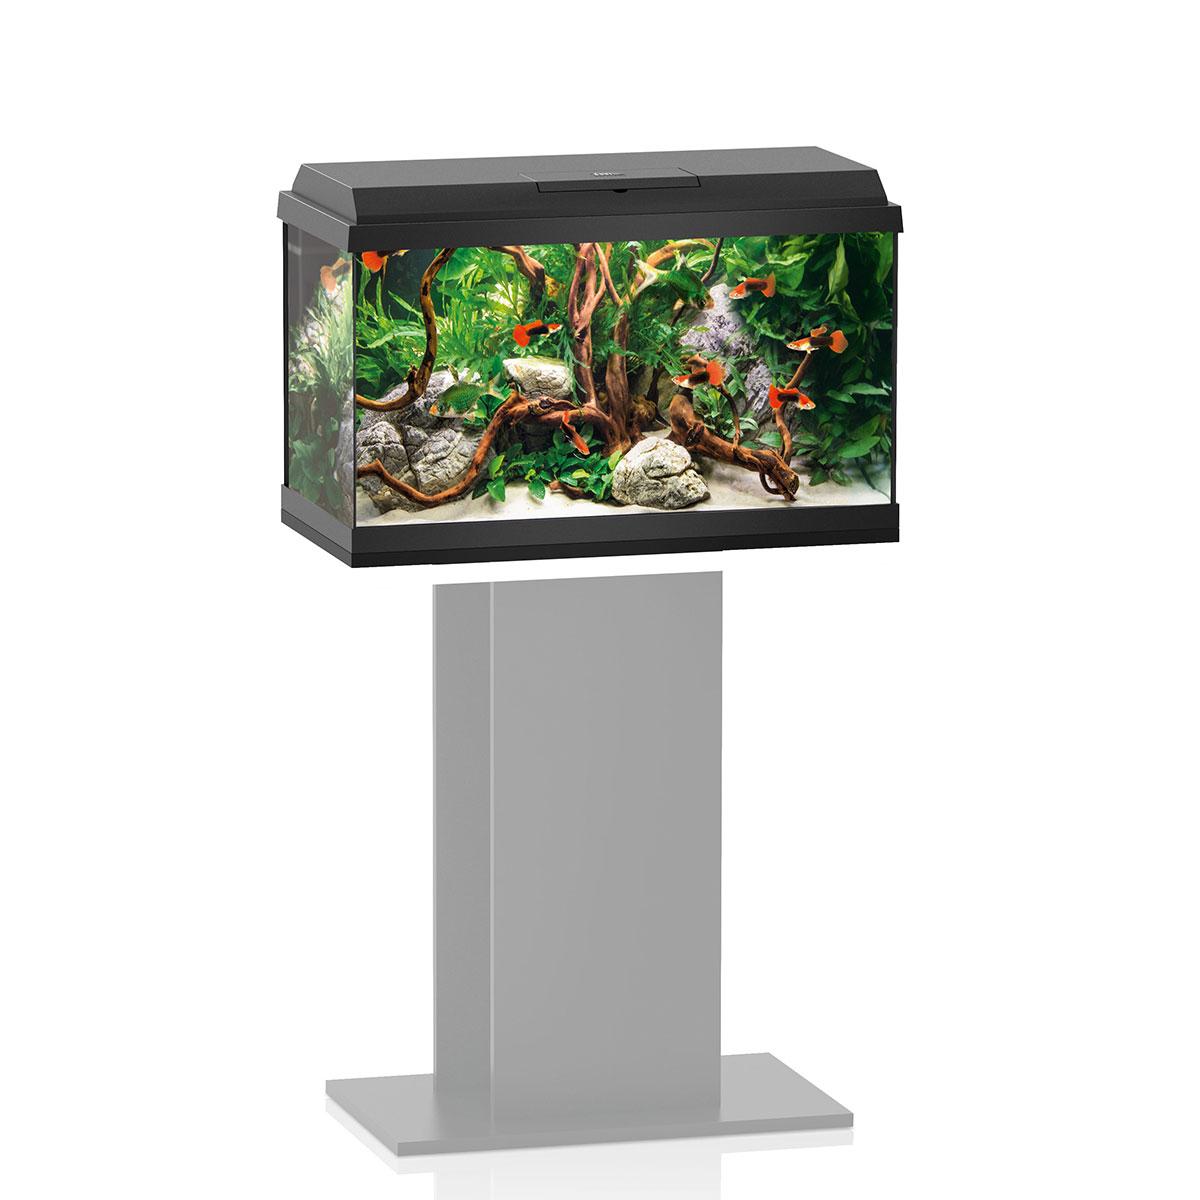 juwel aquarium primo 60 schwarz g nstig kaufen bei zooroyal. Black Bedroom Furniture Sets. Home Design Ideas